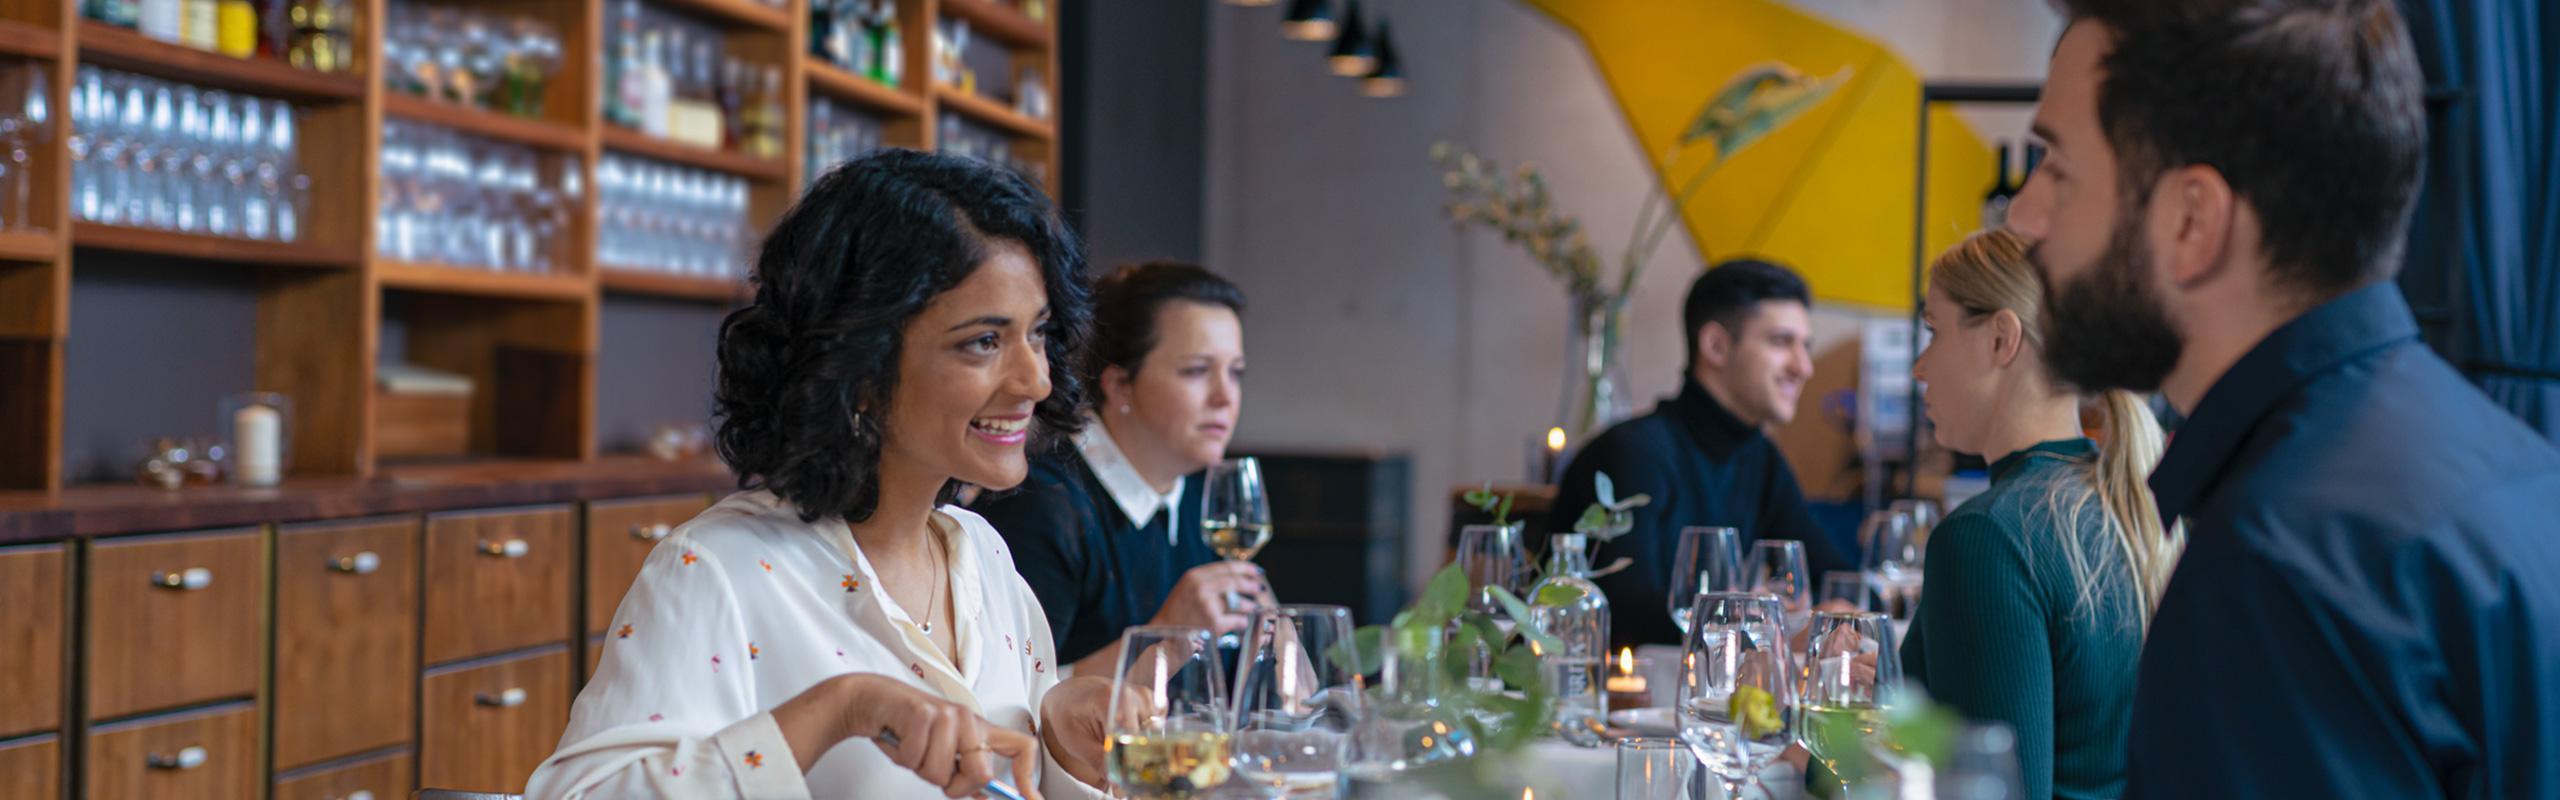 BRITA ekskluzywne restauracje sushi